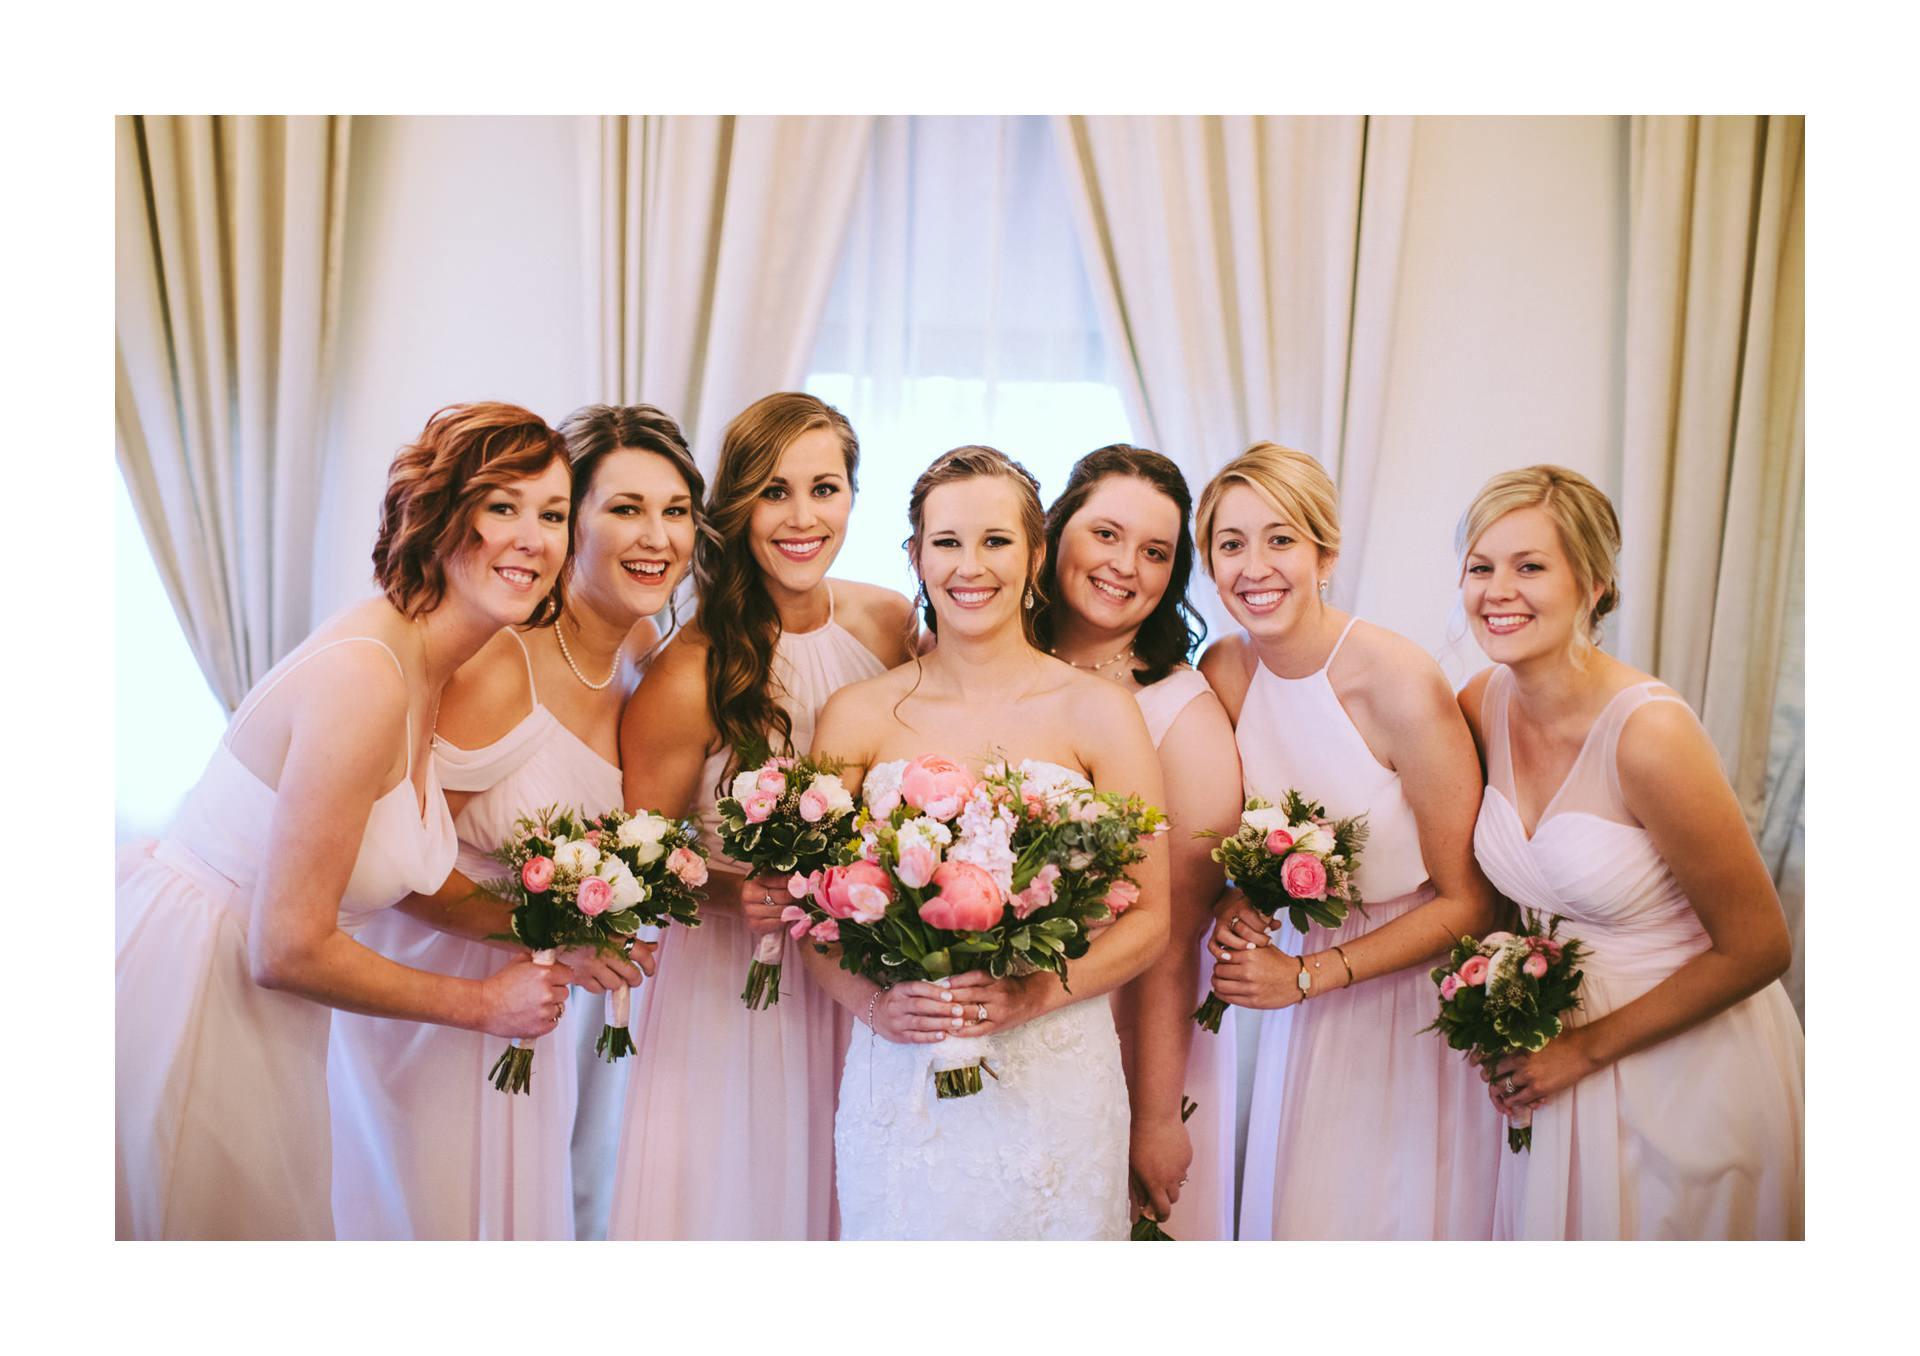 Cleveland Wedding Photographer at Whitehall Columbia 21.jpg